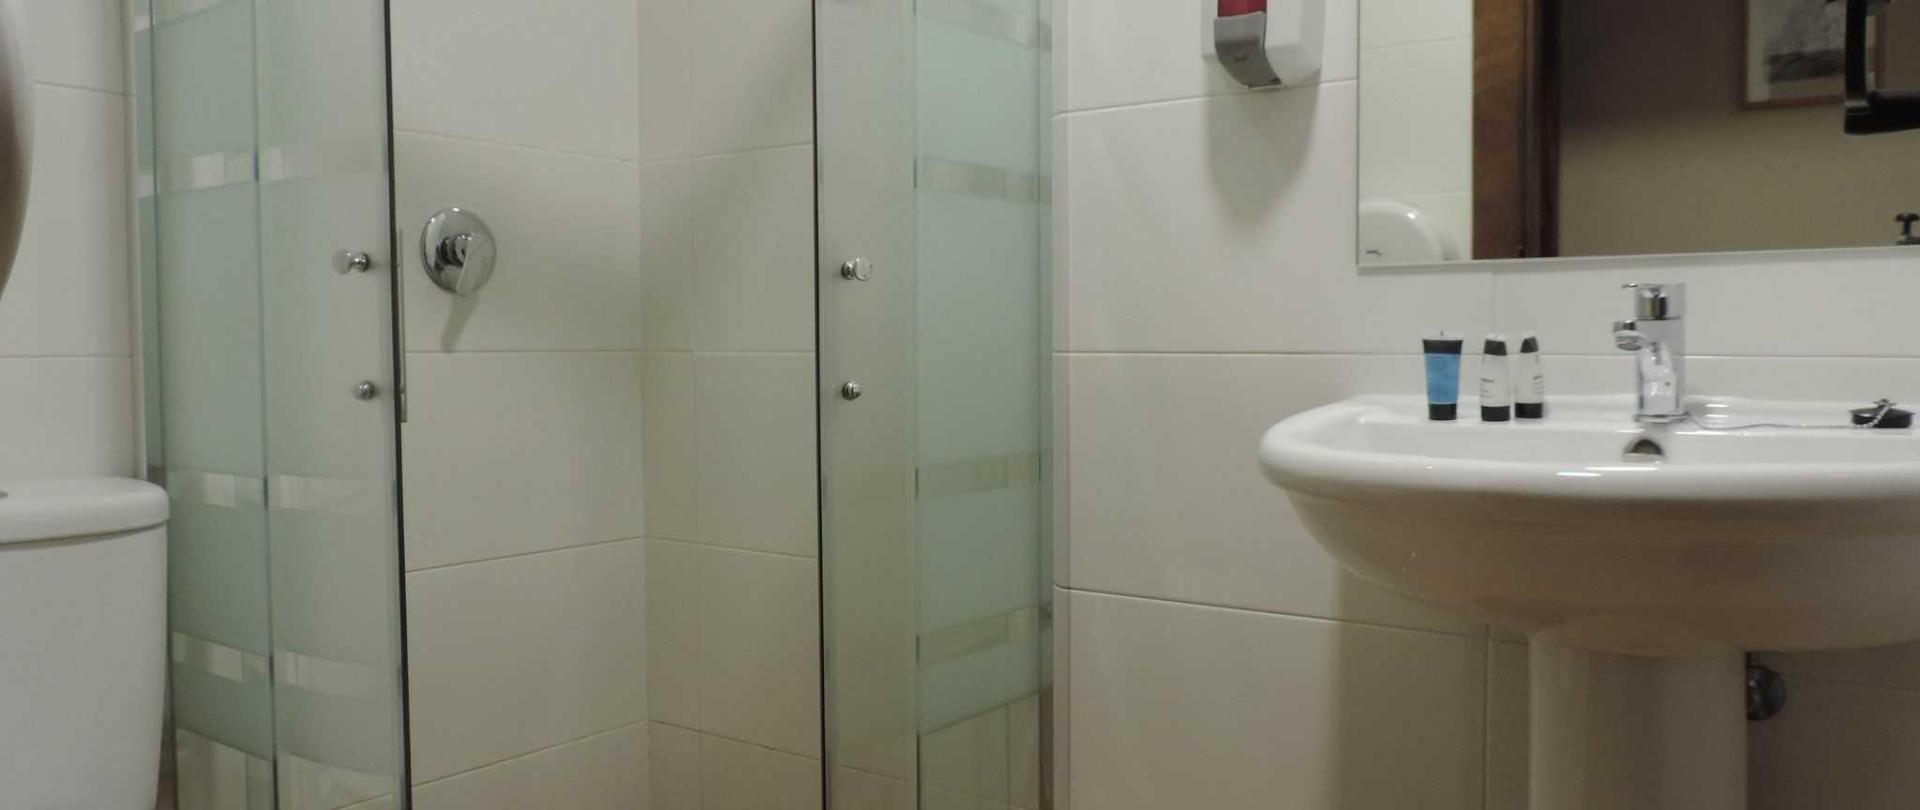 Baño habitación privada.JPG